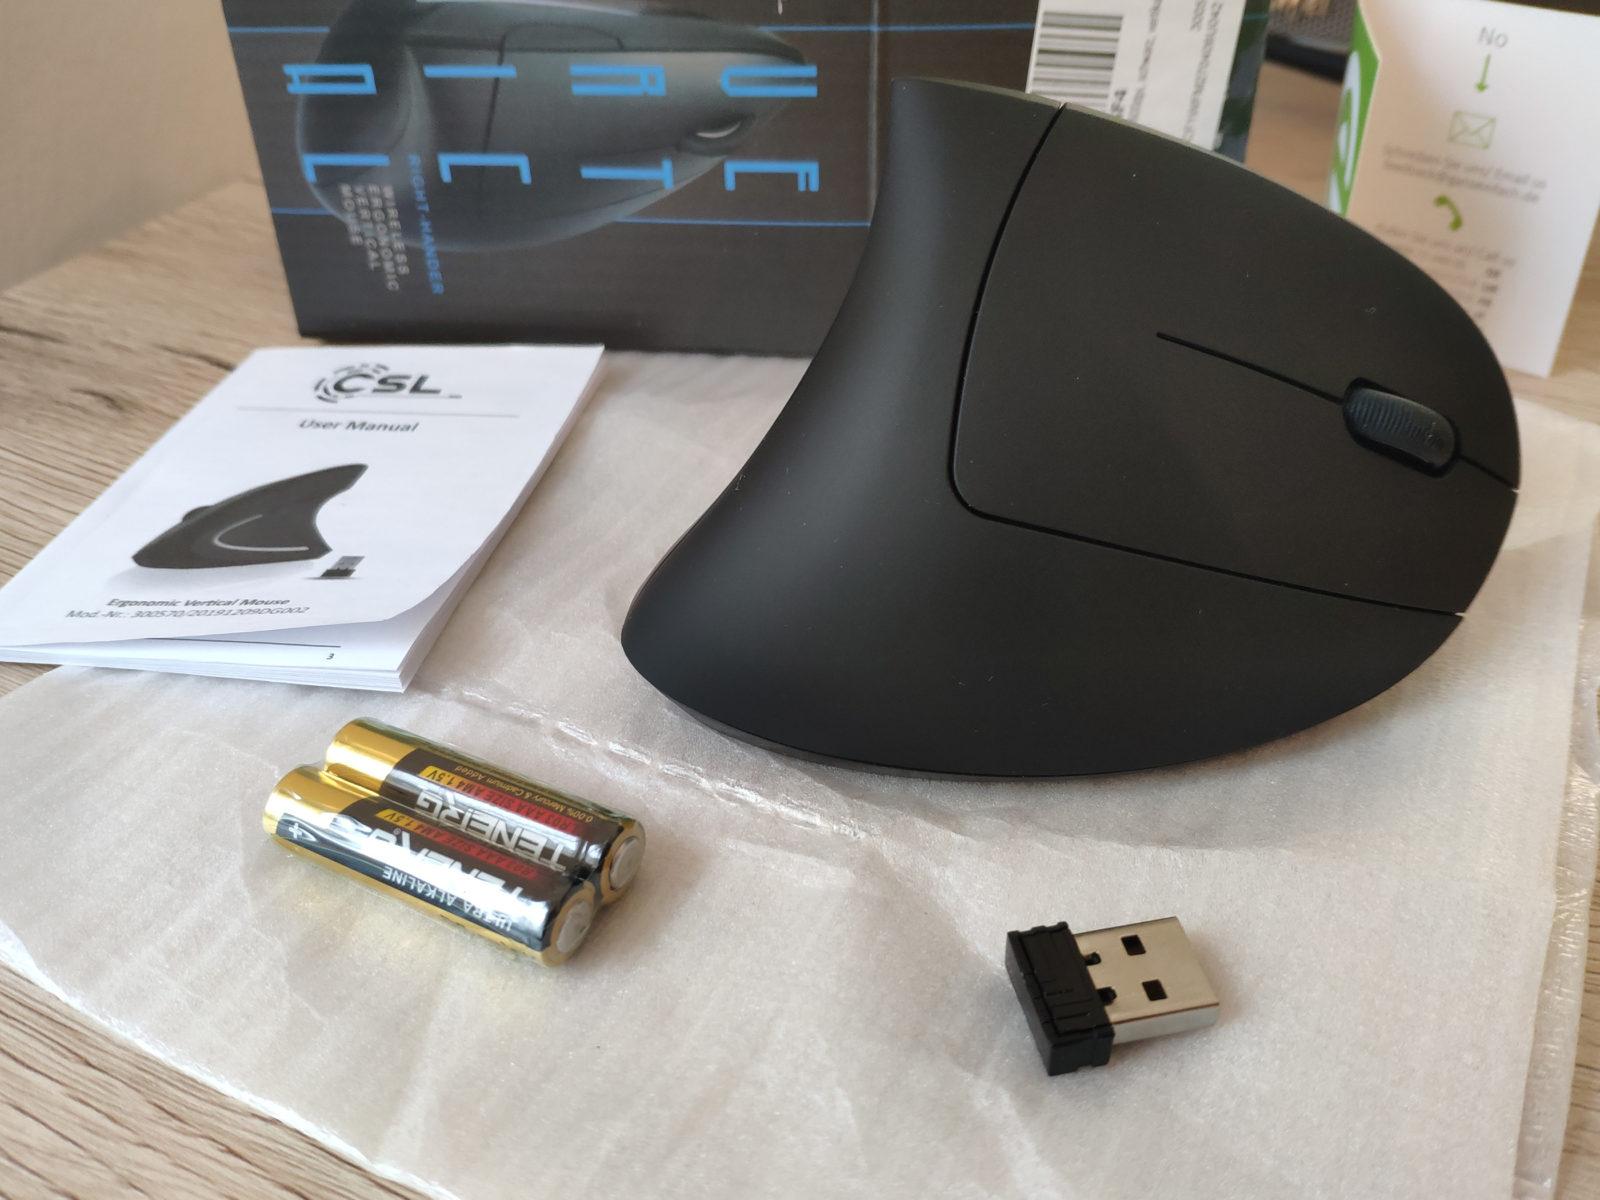 Packungsinhalt der CSL Vertikale Maus